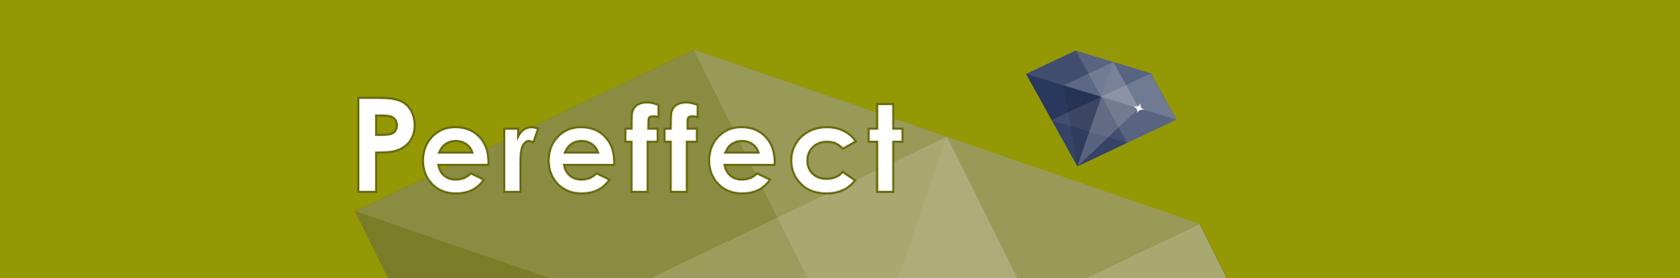 Pereffect